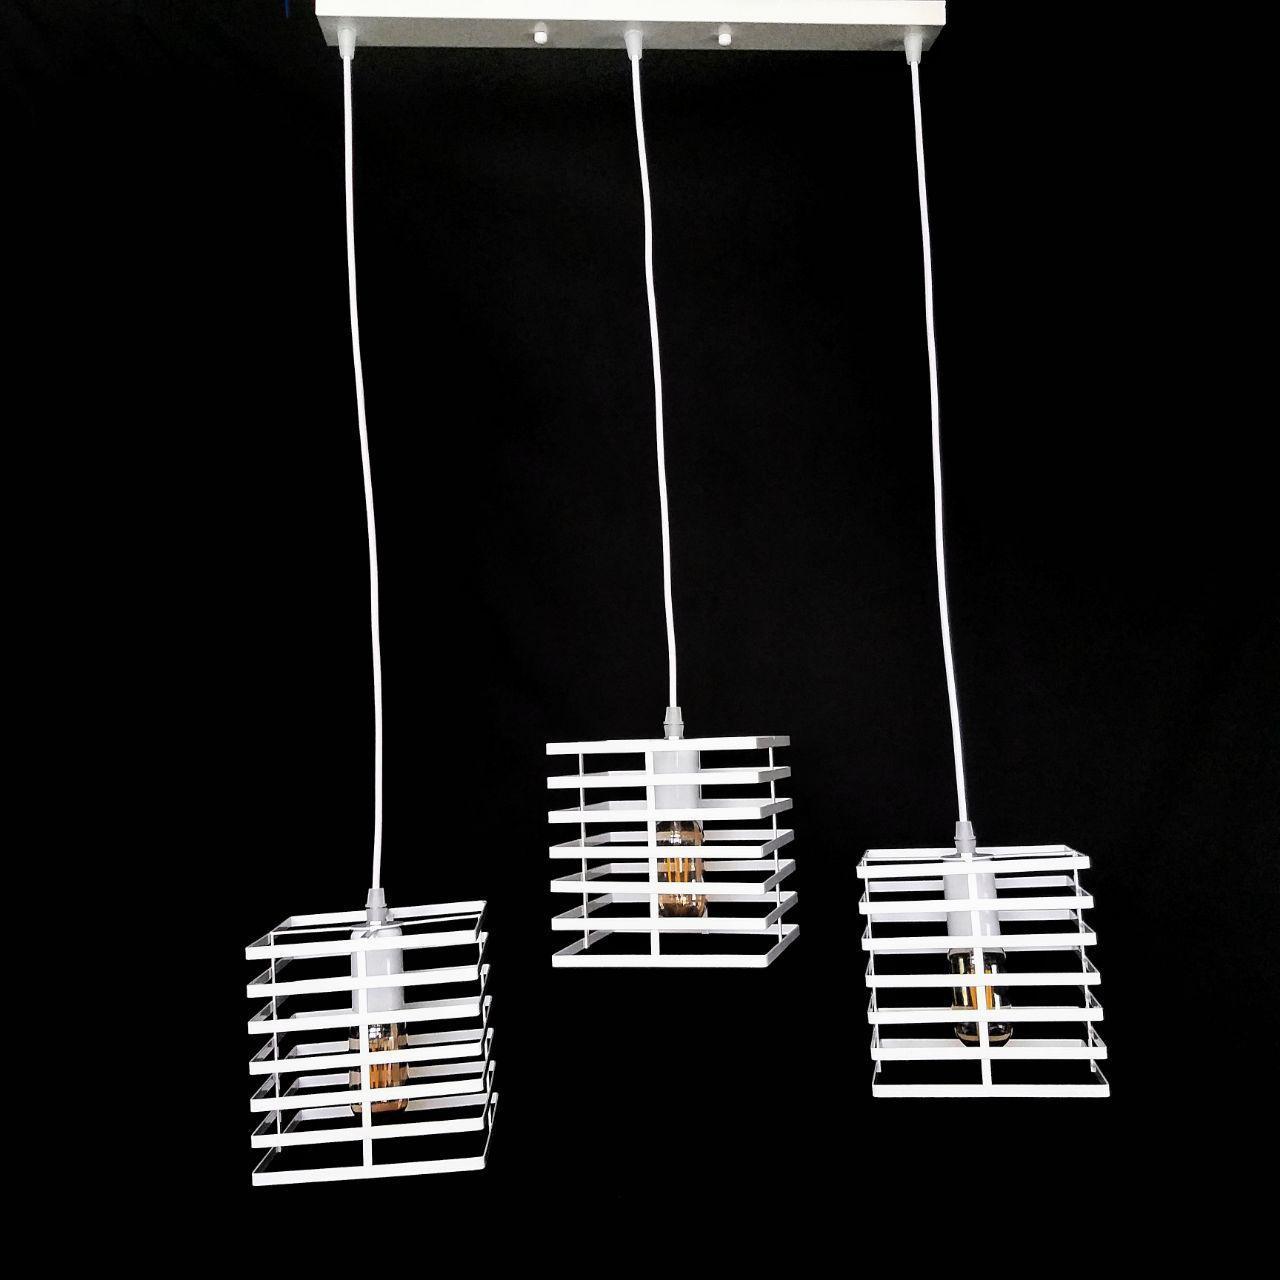 Люстра подвесная на 3 лампы в стиле лофт  белая  YS-TY001-P/3  WH